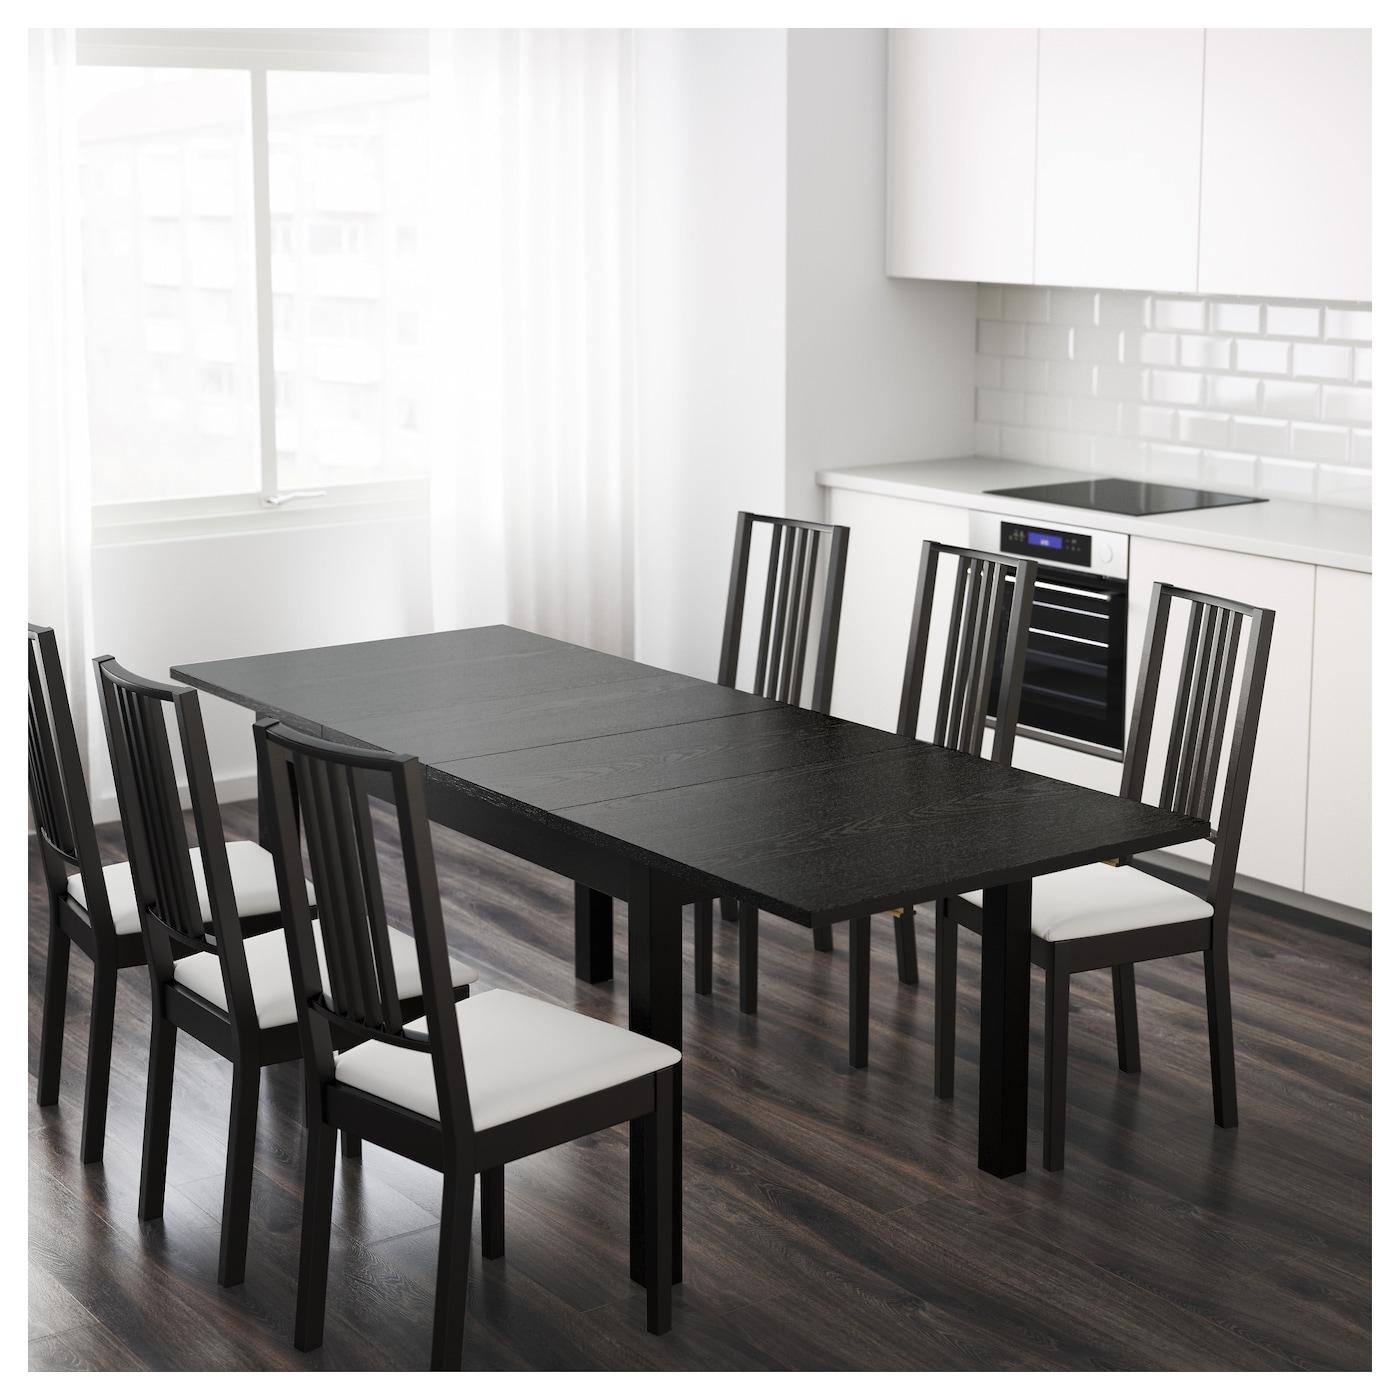 bjursta uitschuifbare tafel bruinzwart 140 180 220 x 84 cm. Black Bedroom Furniture Sets. Home Design Ideas